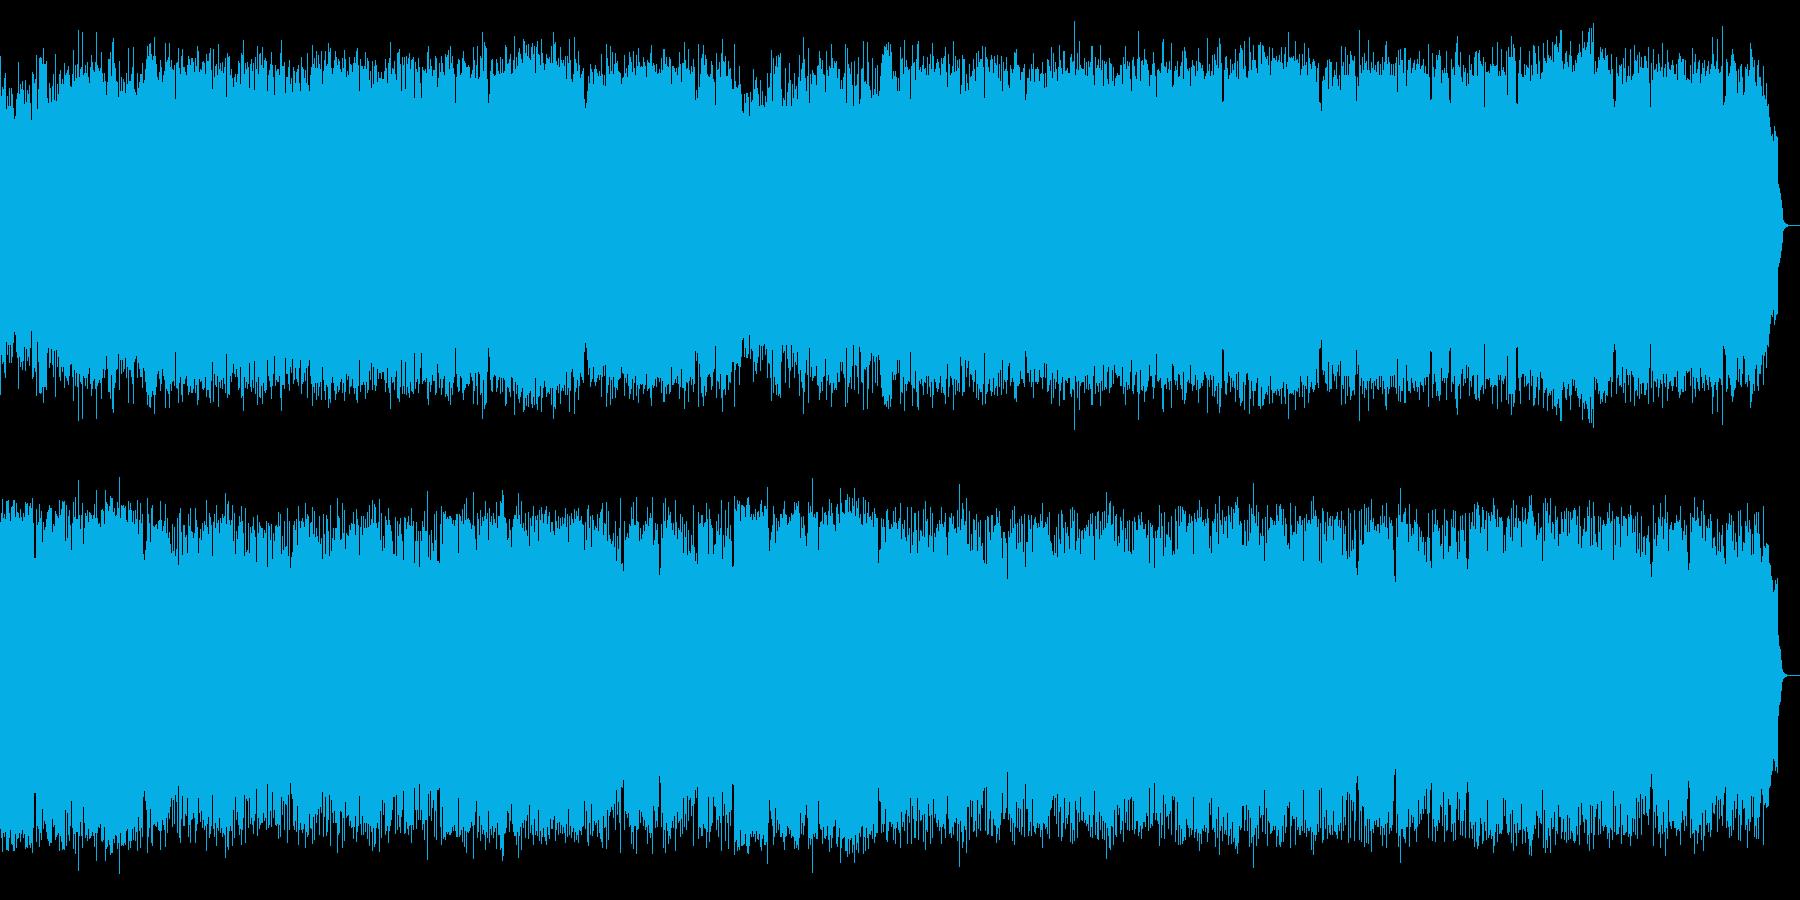 SAXほっこりする温かい曲風の再生済みの波形